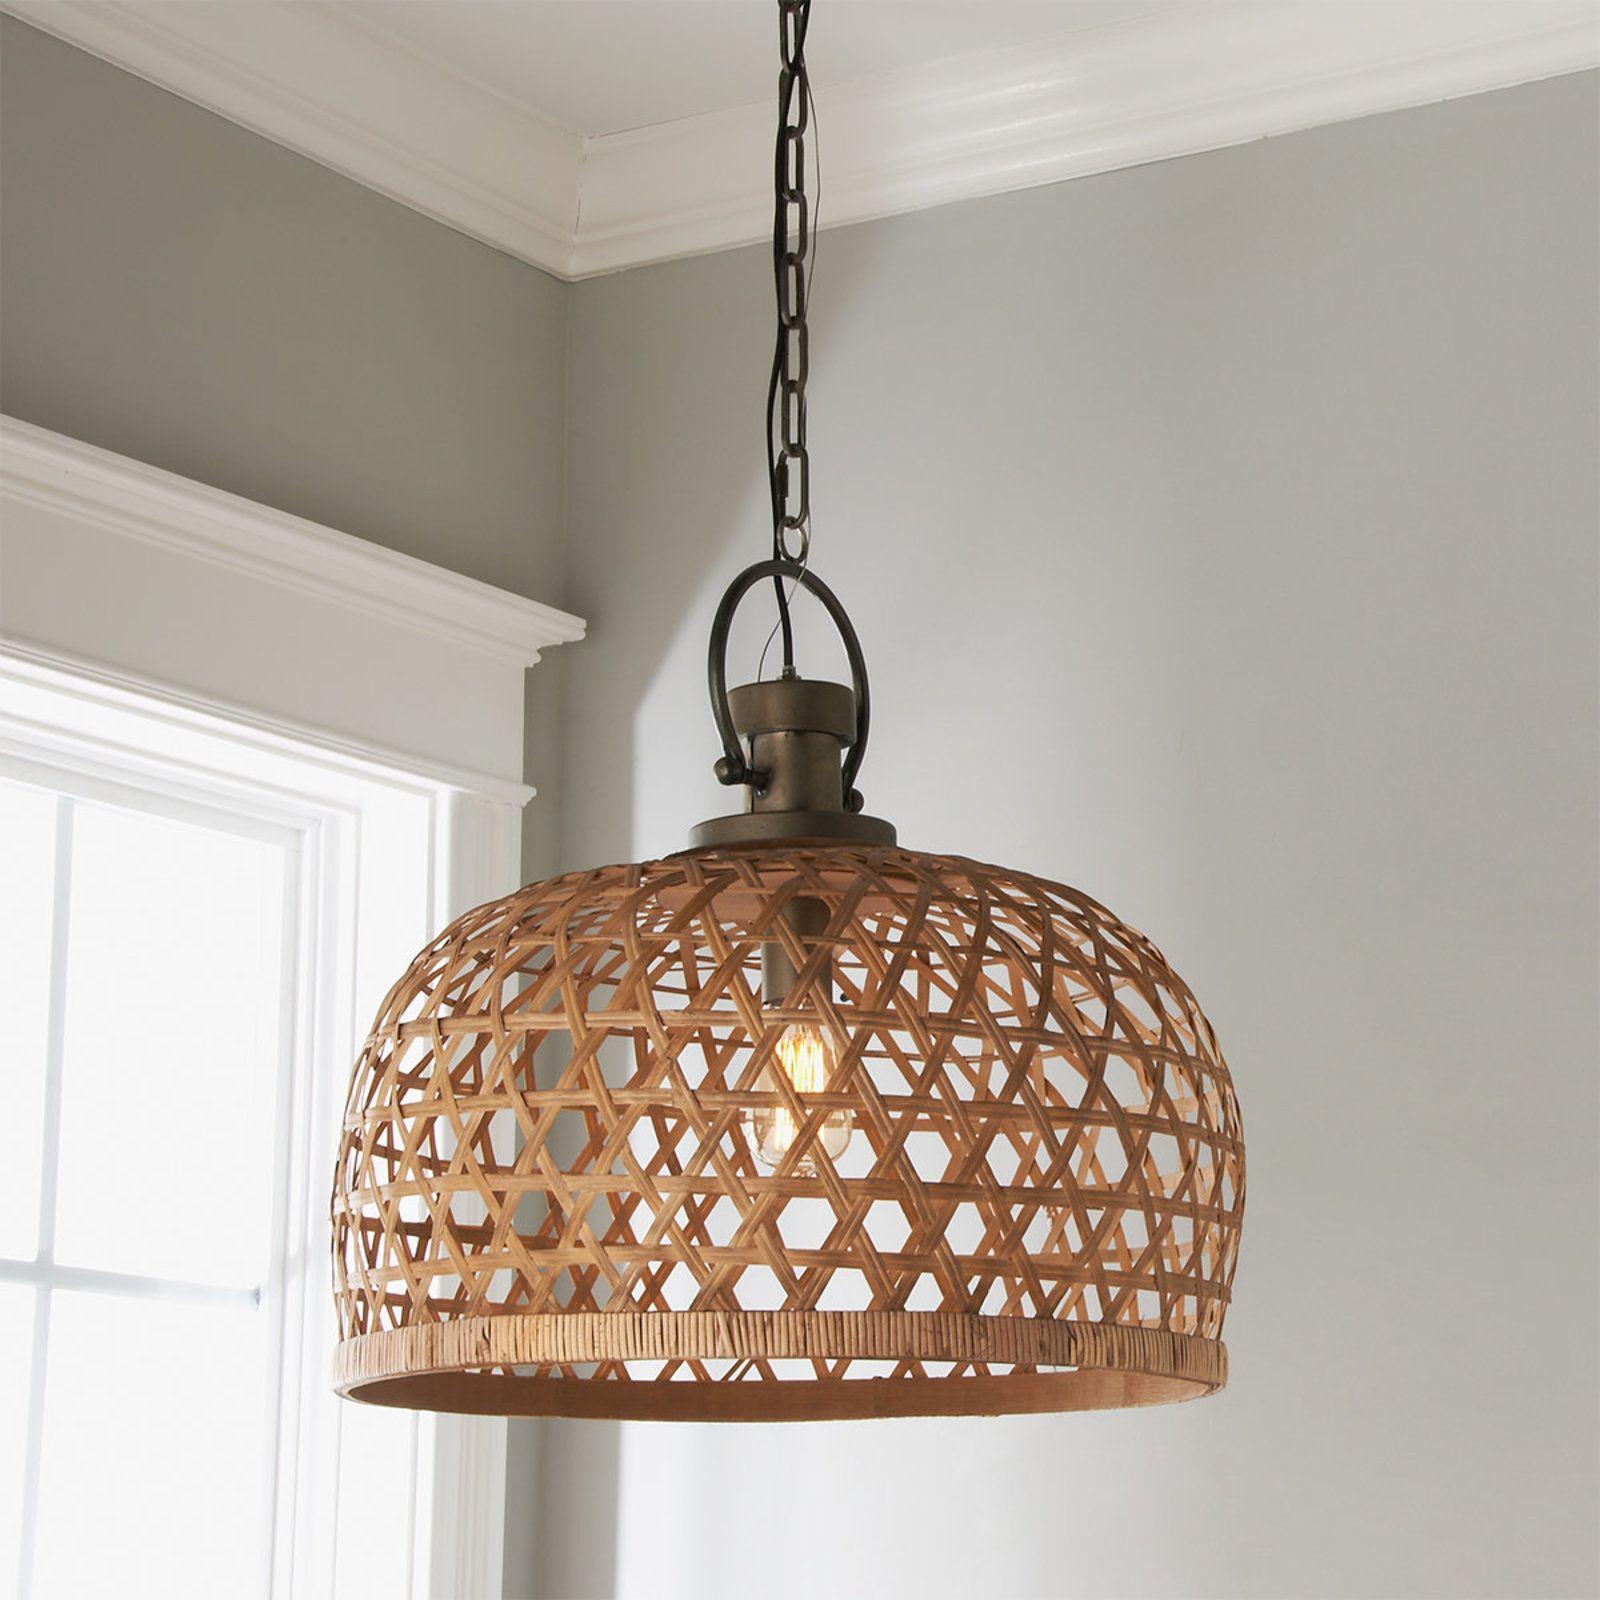 Basketweave Bamboo Pendant Shades of Light Rustic